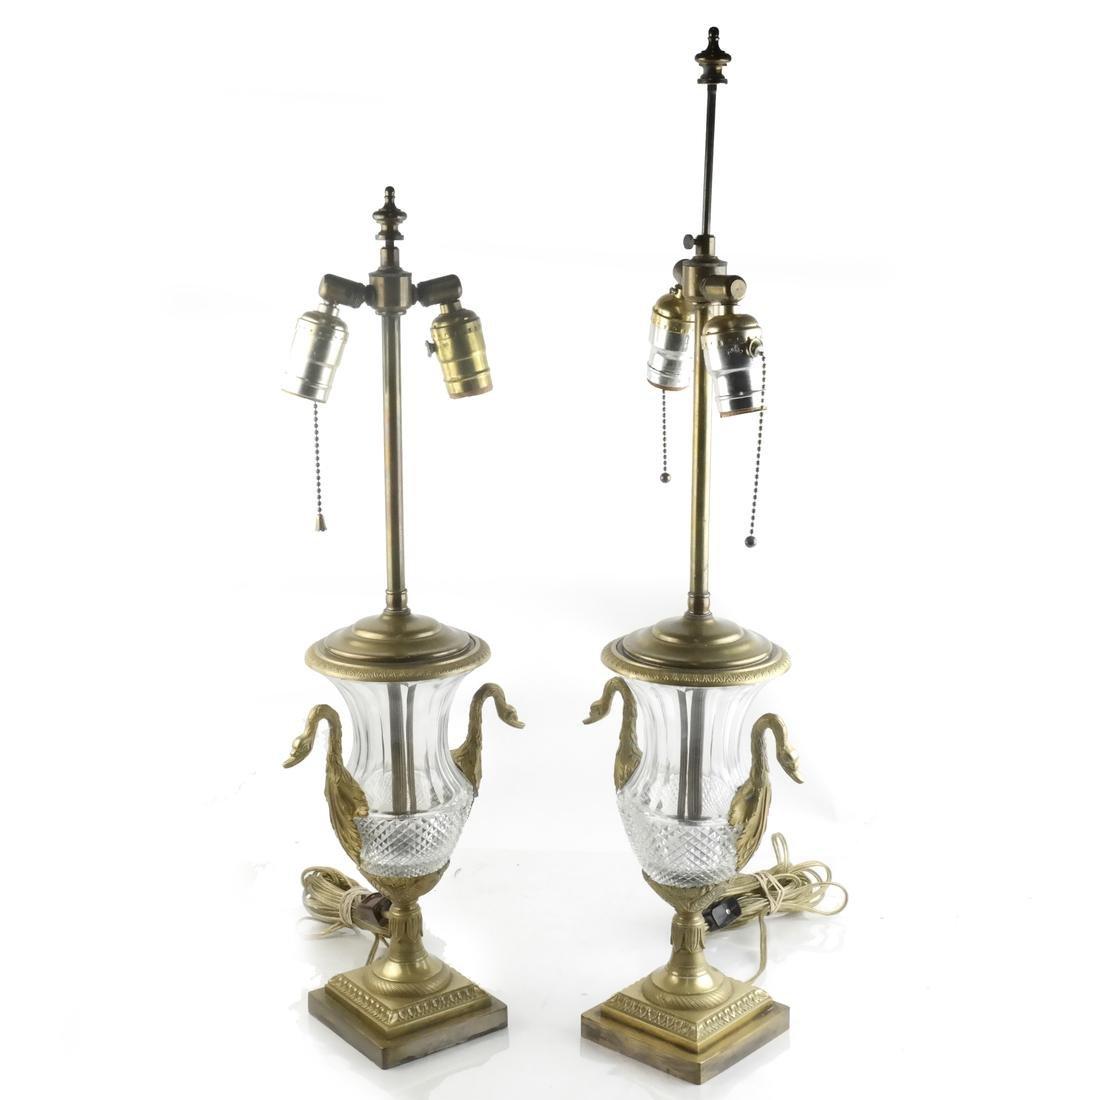 Pair of Classical Swan-Form Lamps